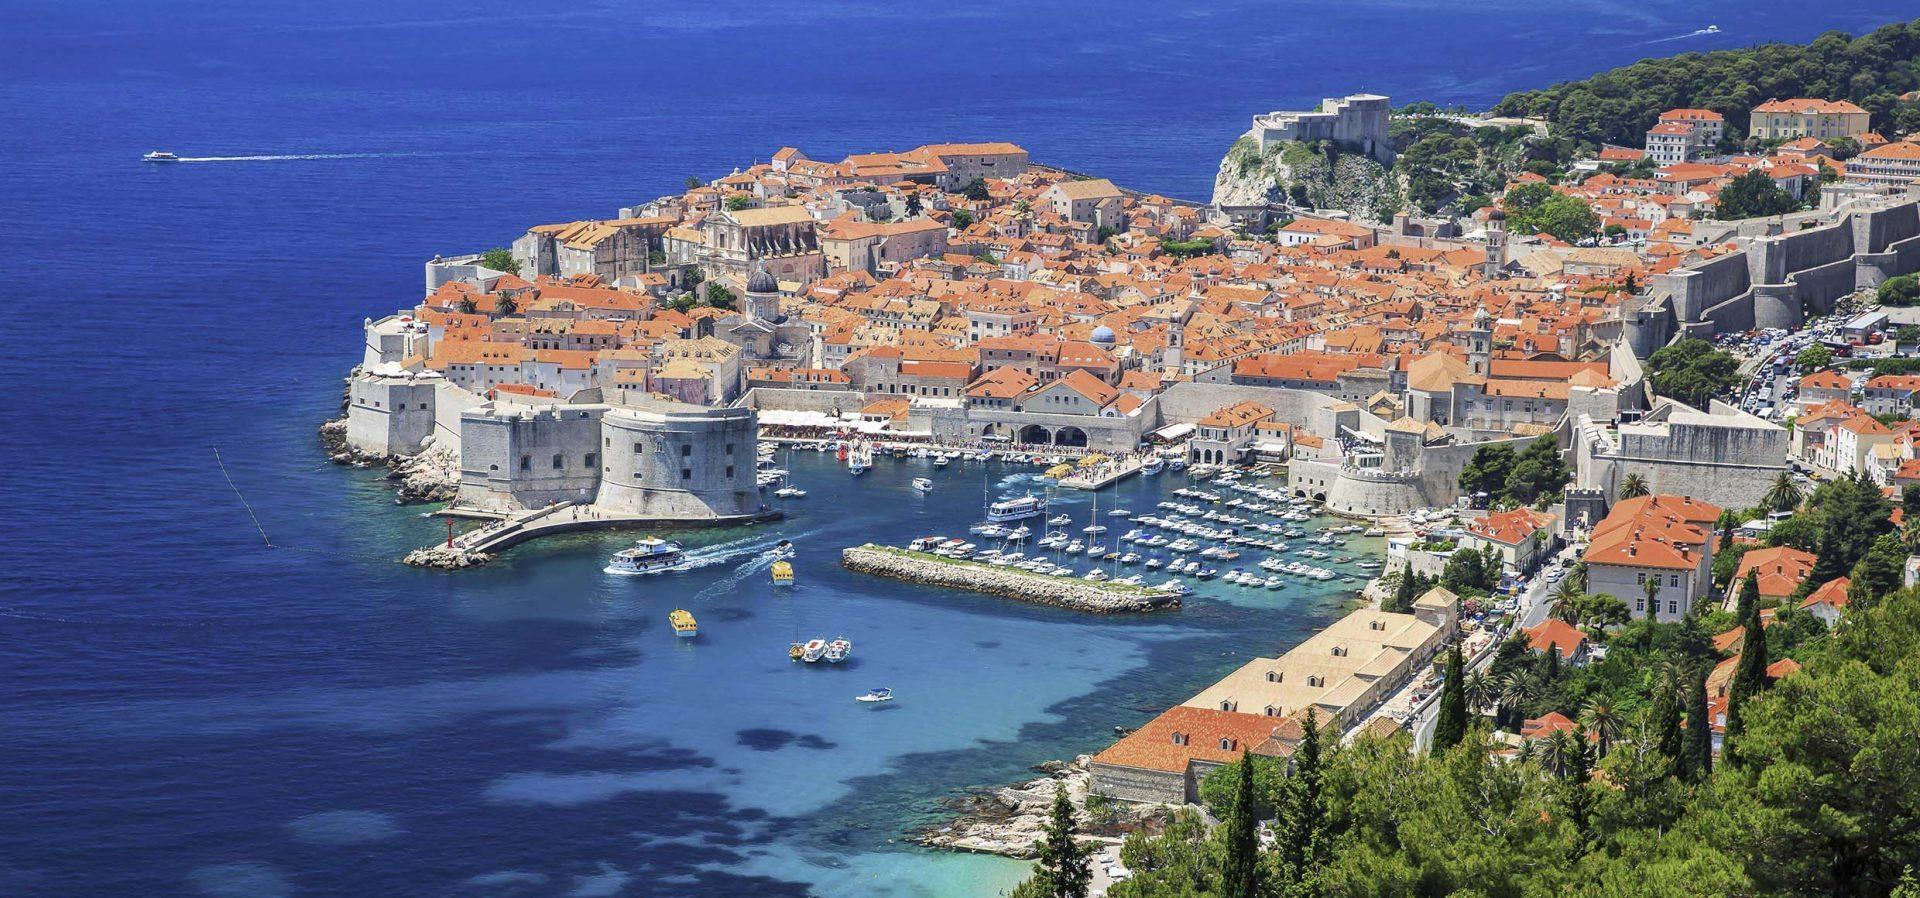 Kroatien Uhrzeit